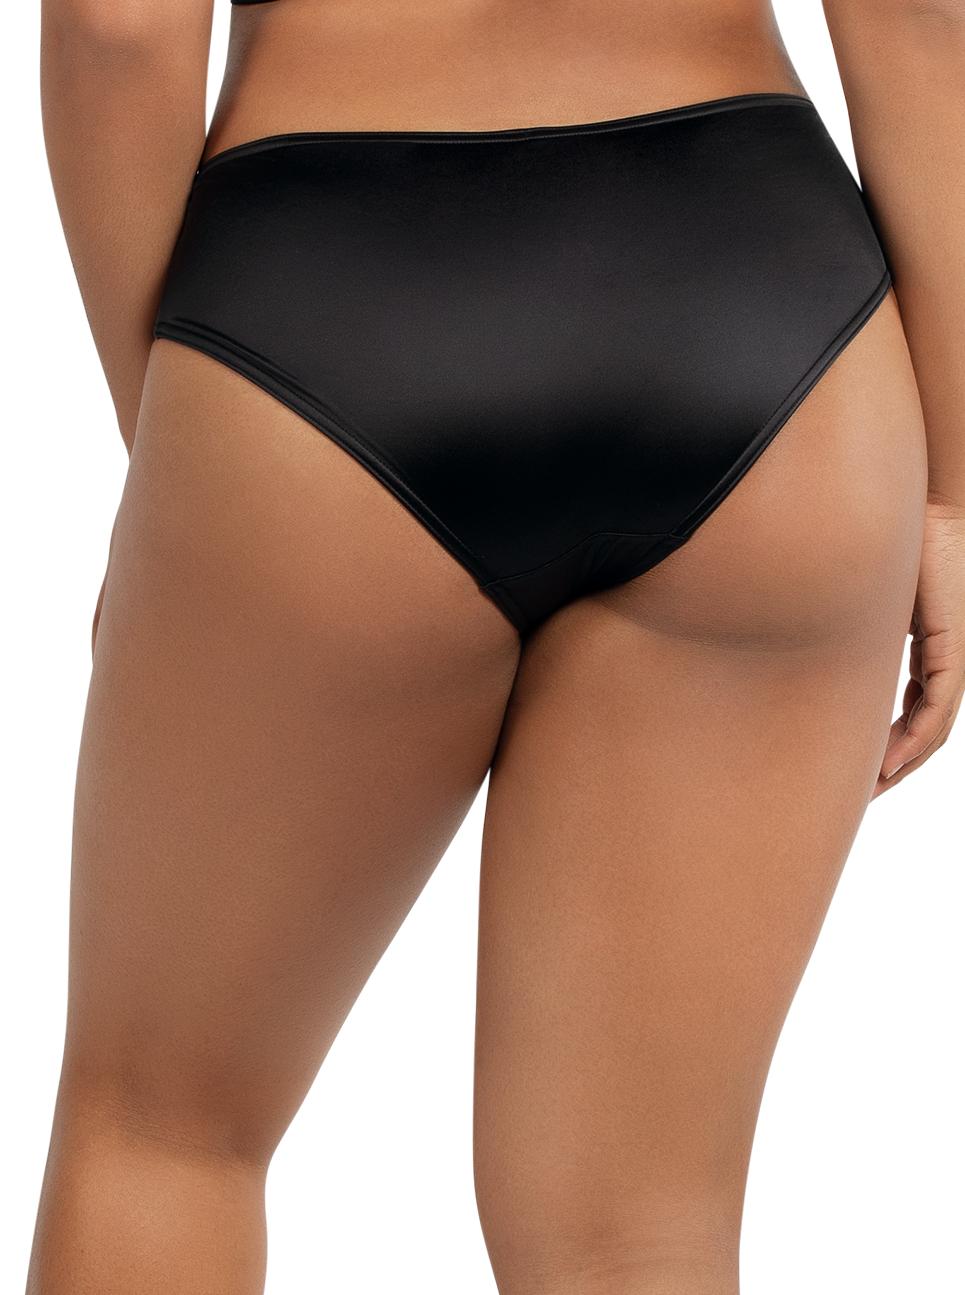 PARFAIT Rita BikiniBottomS8143 Black Back - Rita Bikini Bottom Black S8143